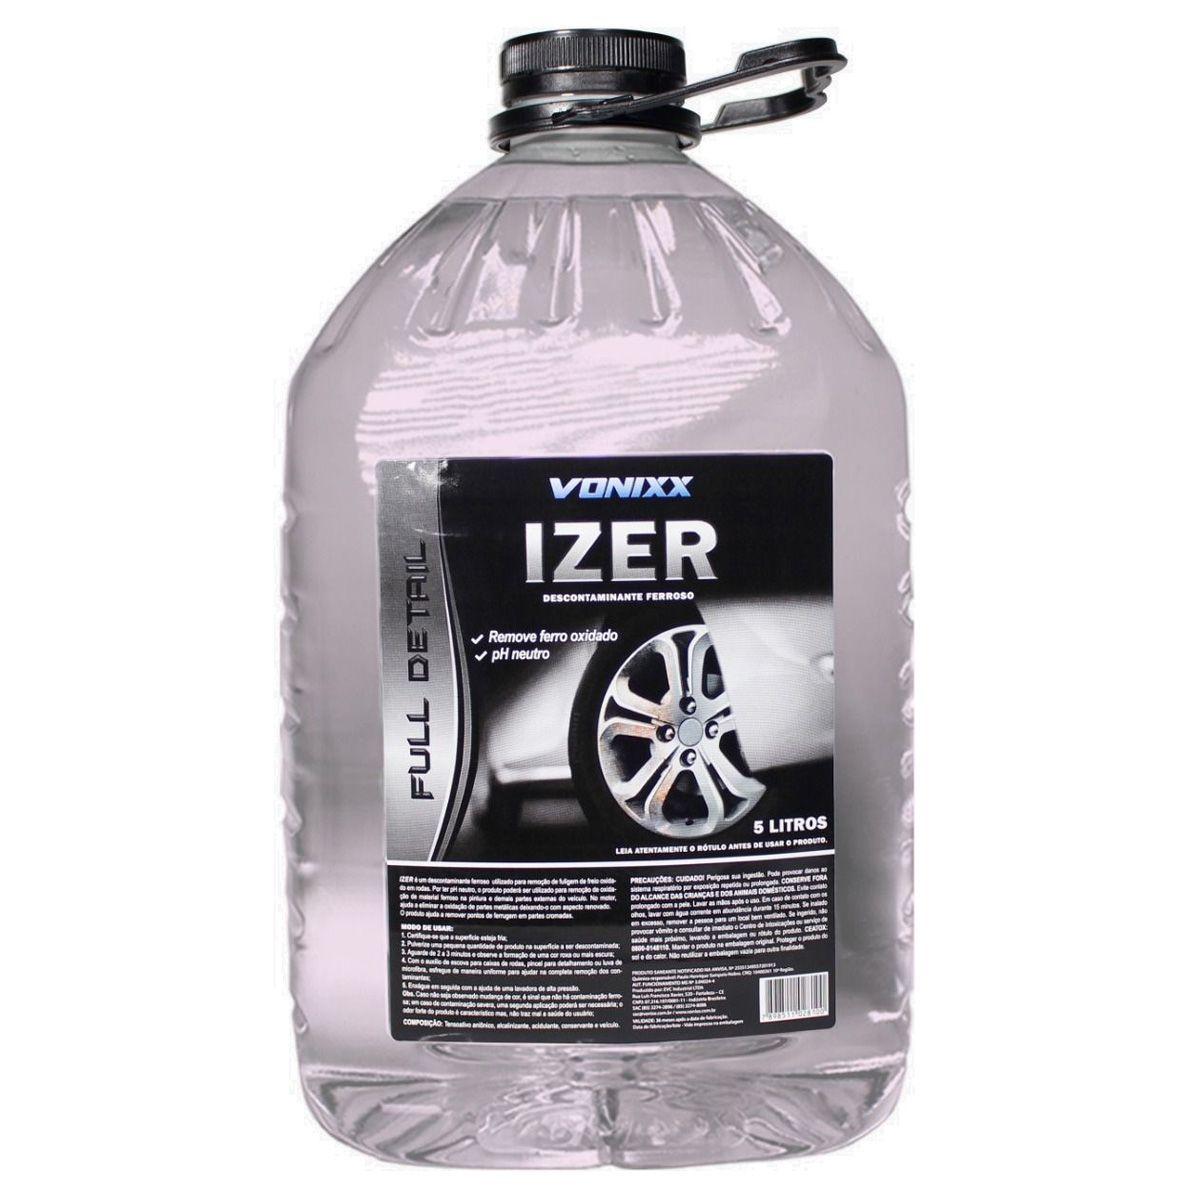 Descontaminante Ferroso Izer 5 Litros Vonixx